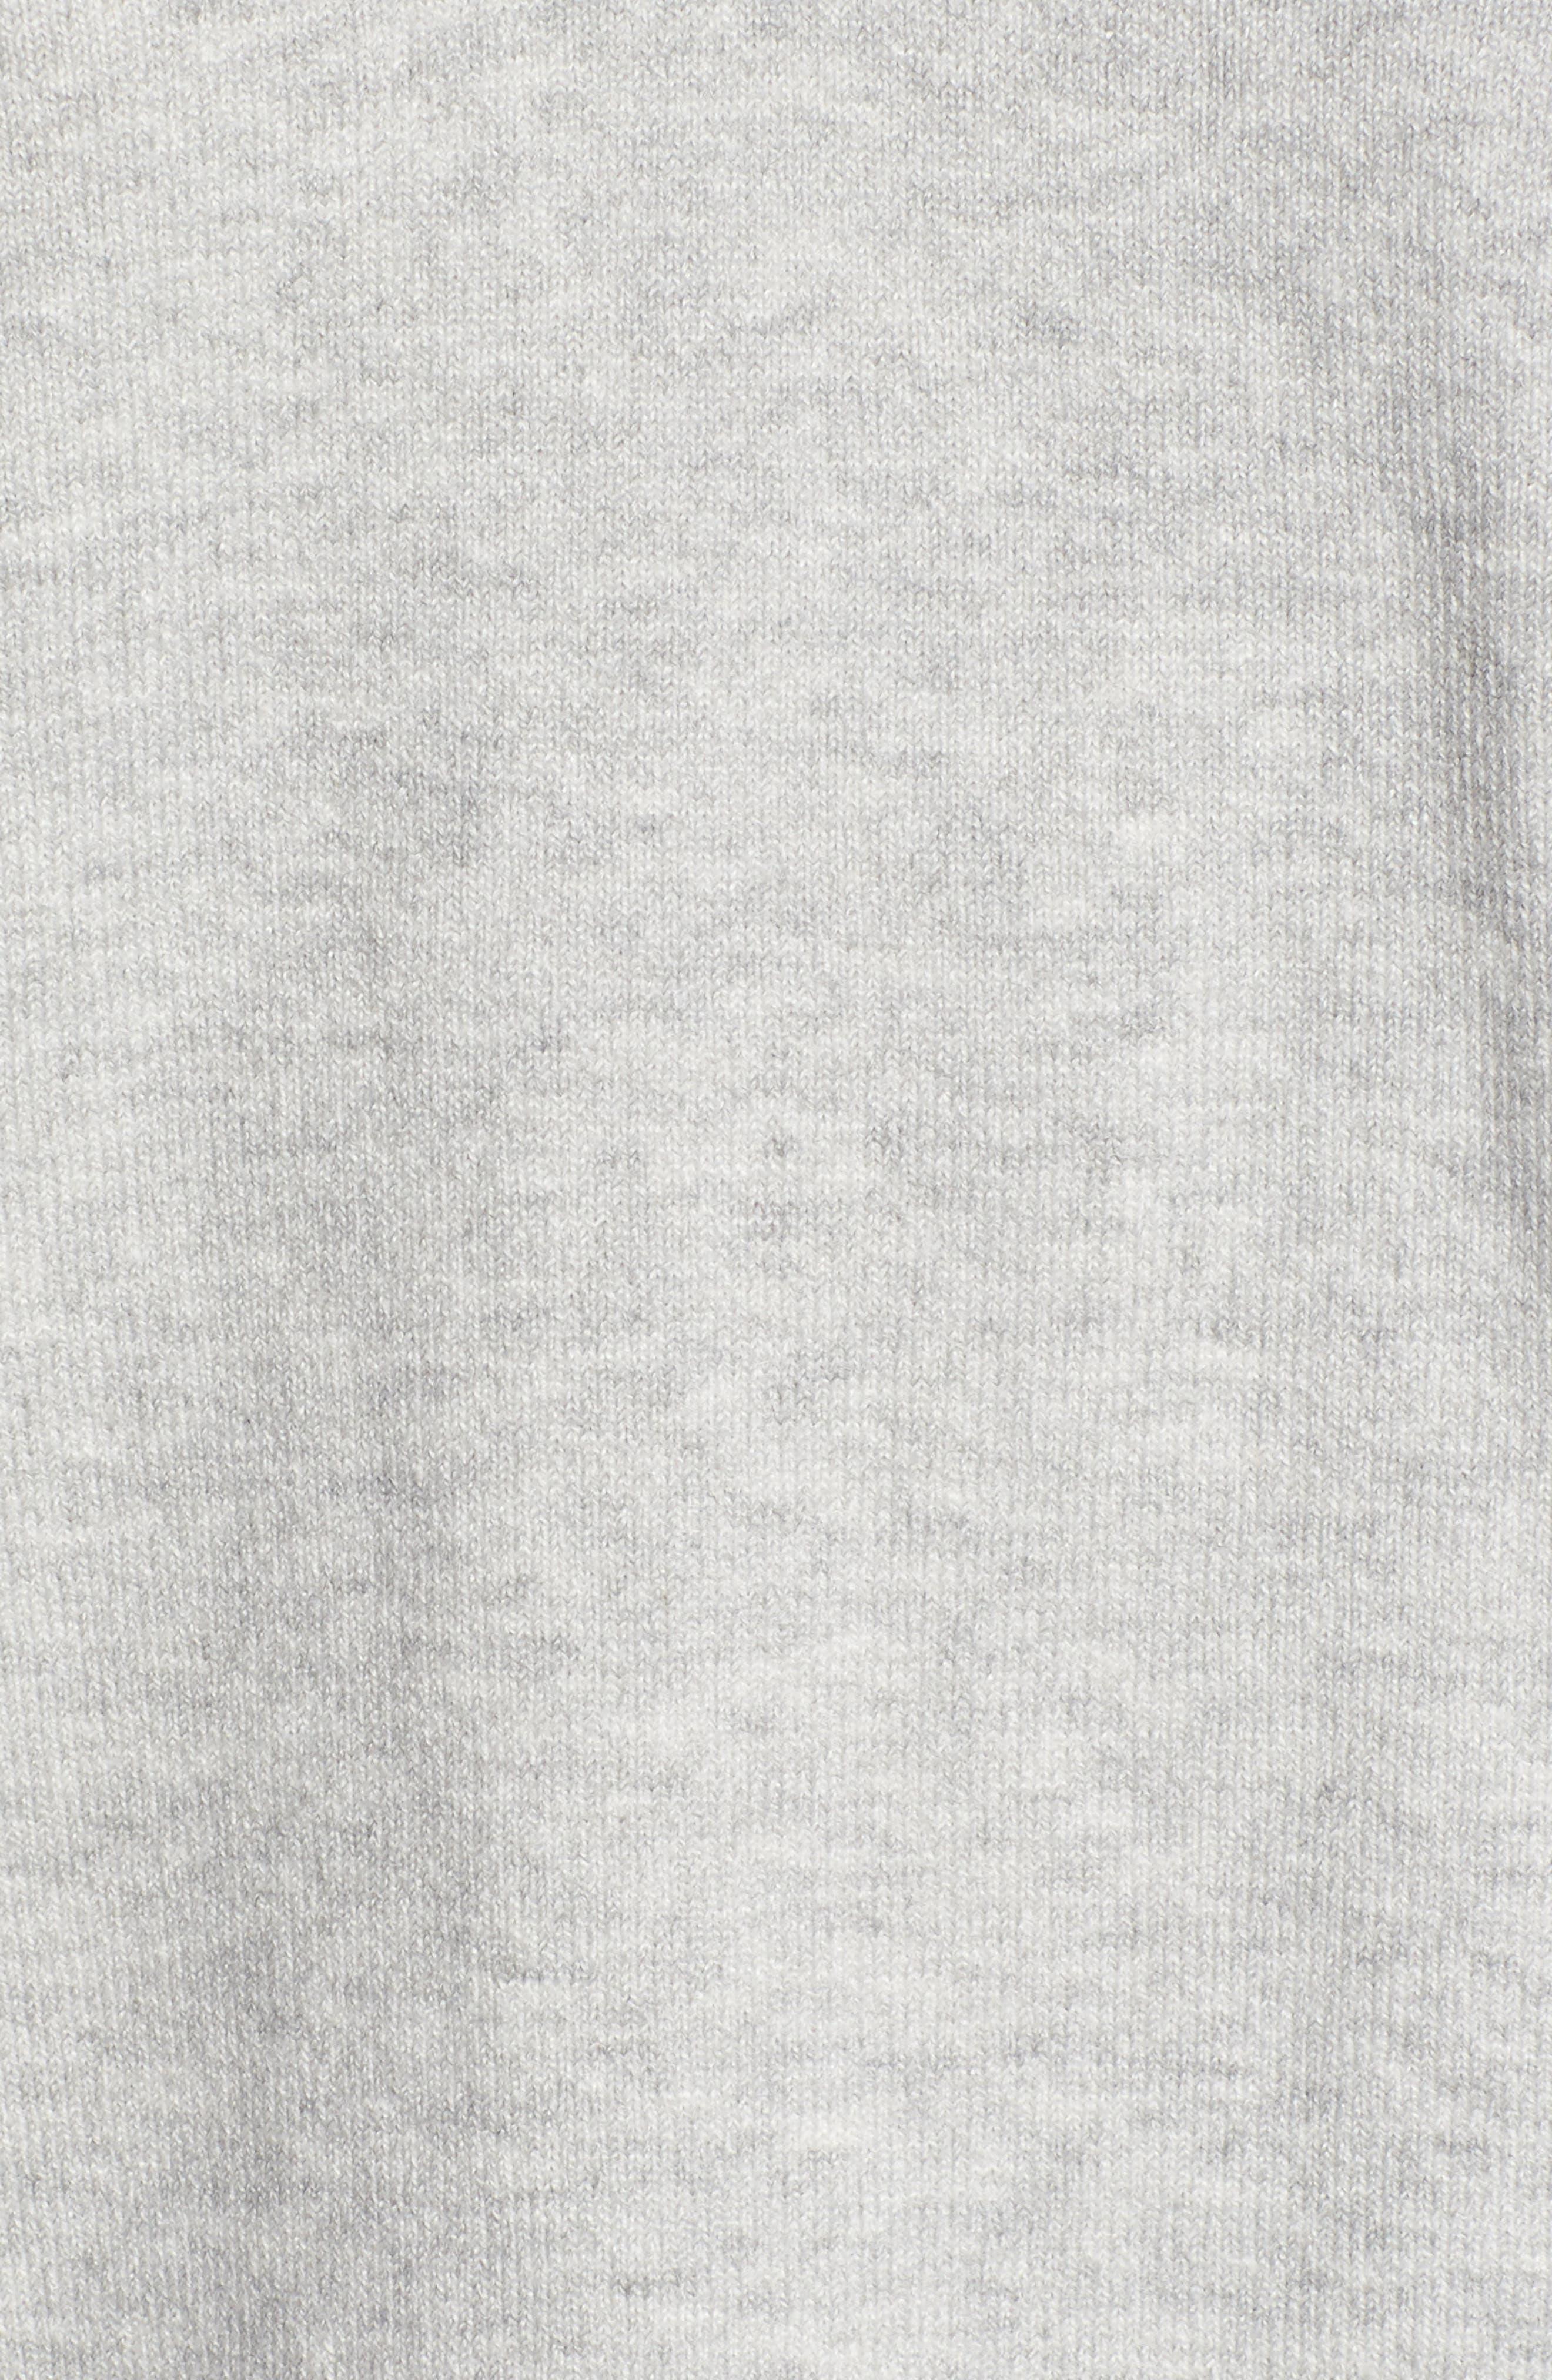 Della Vhari V-Neck Sweater,                             Alternate thumbnail 5, color,                             050